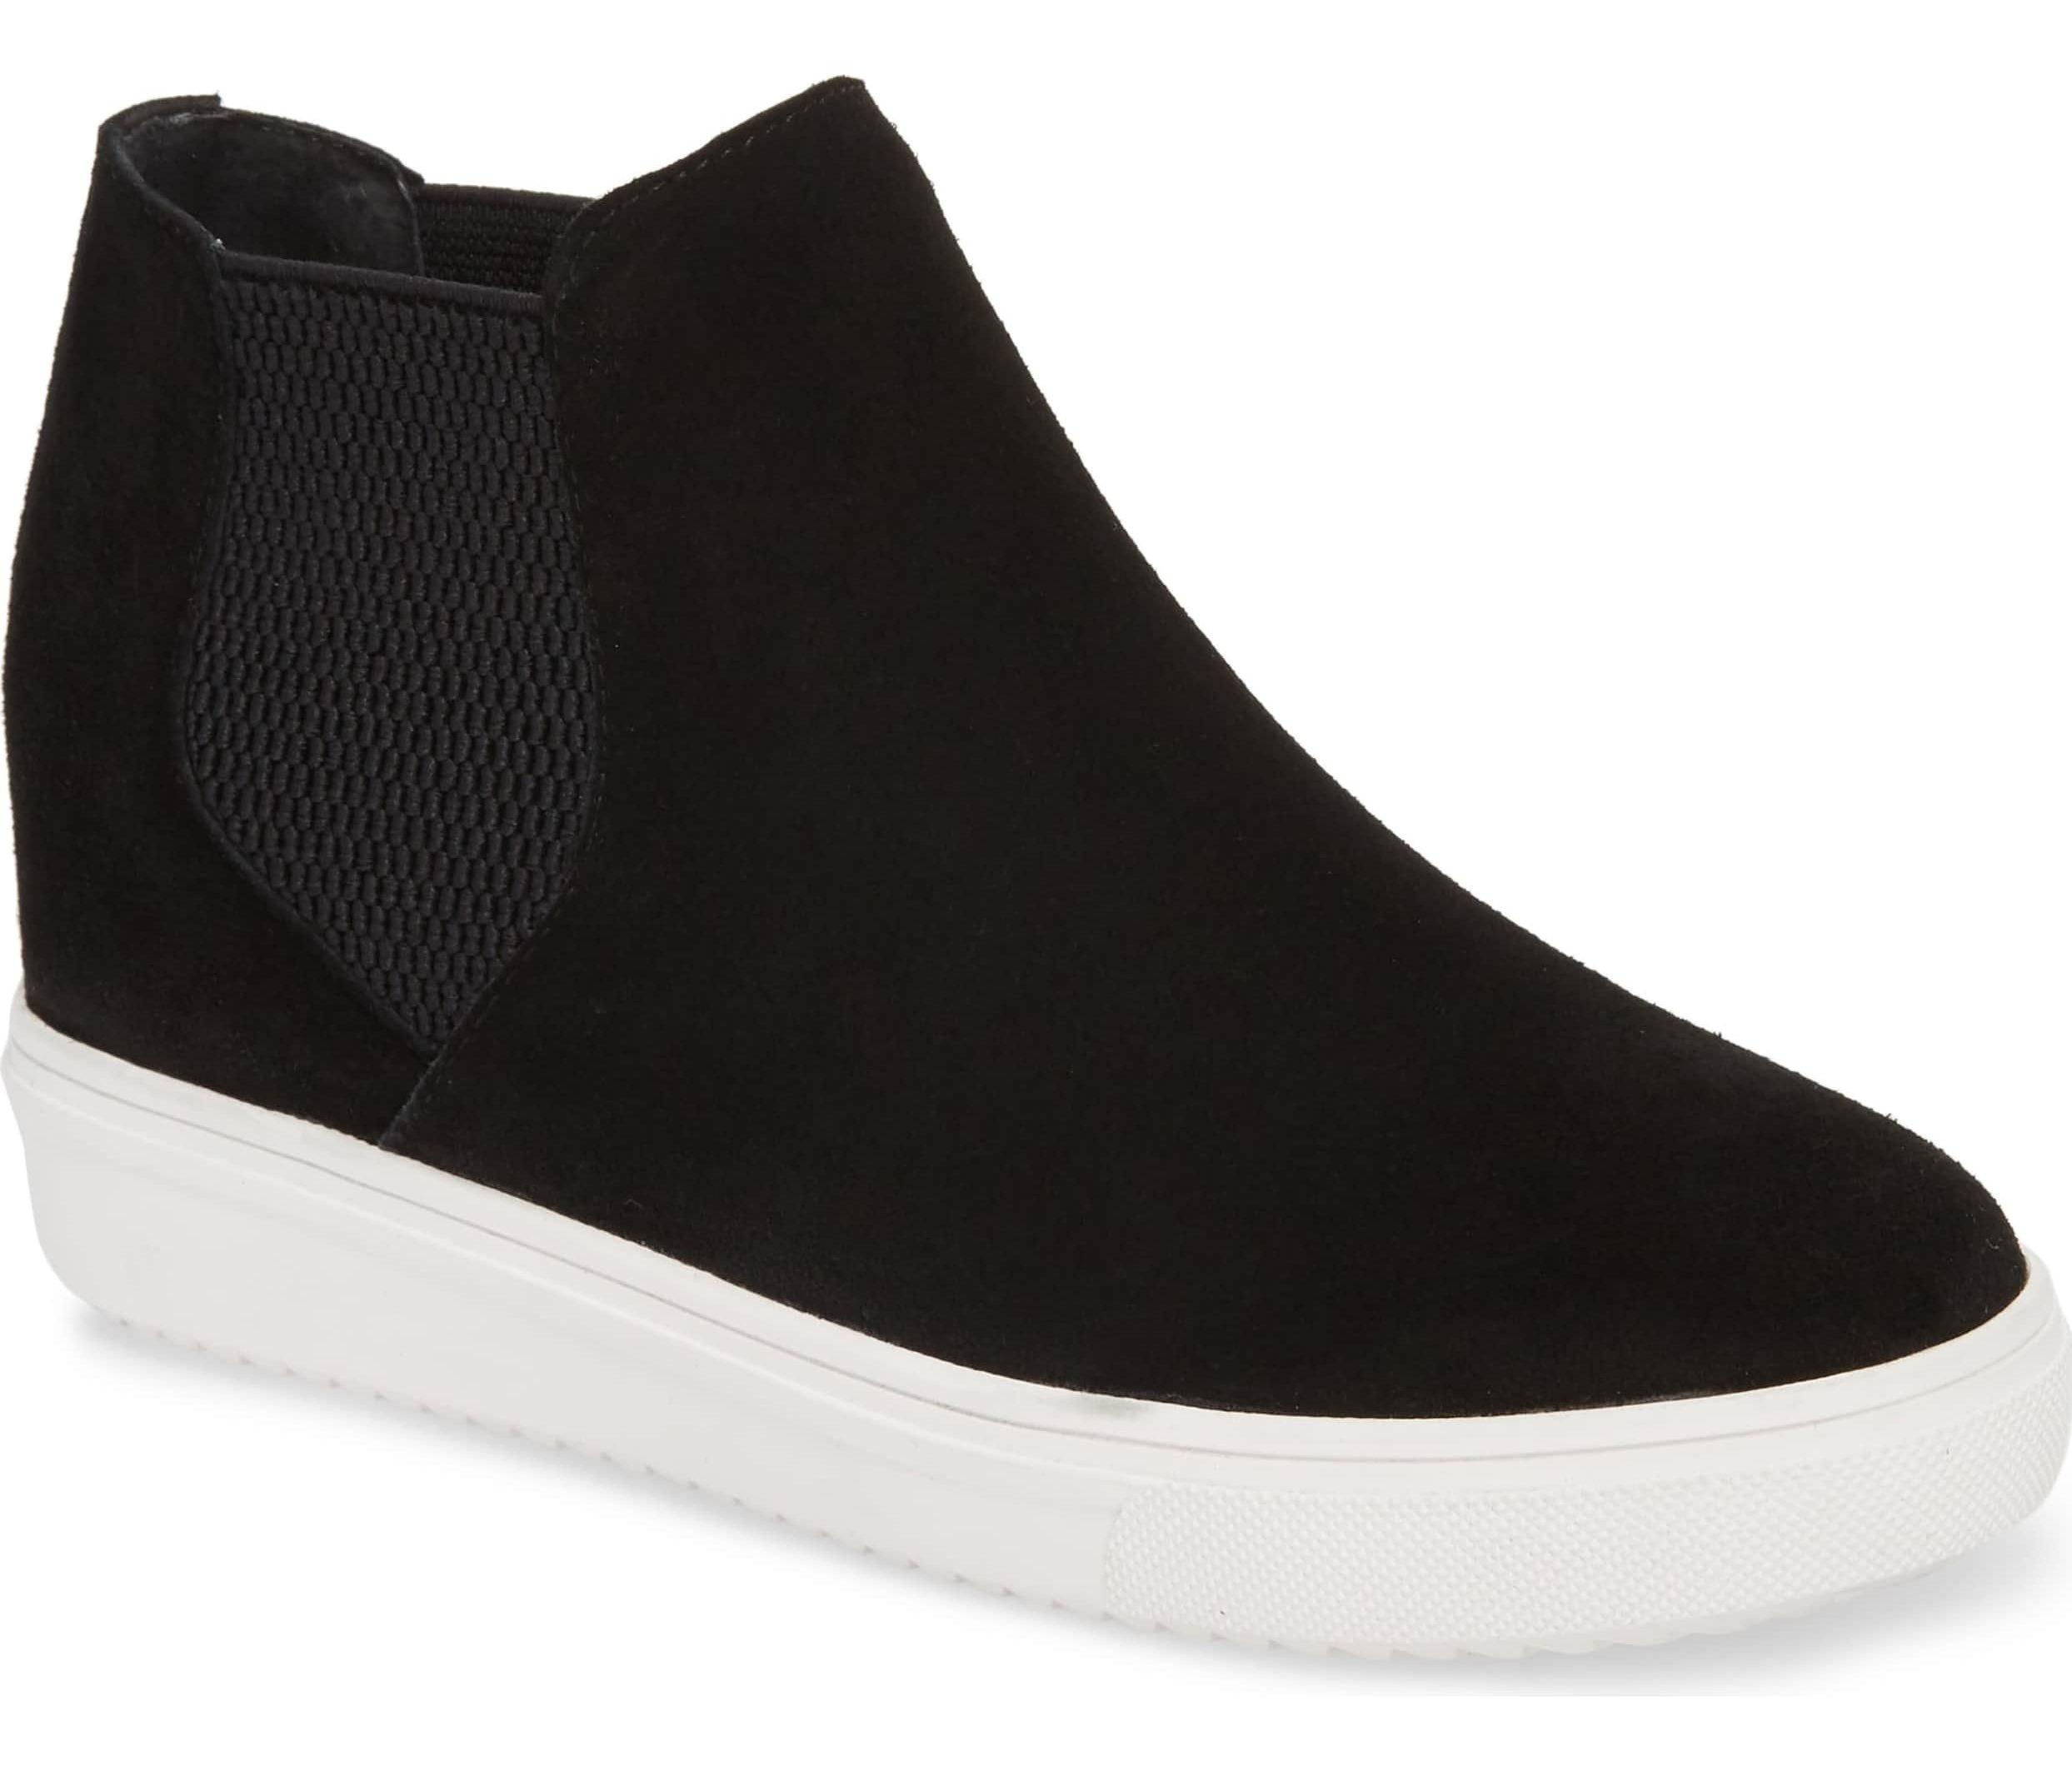 fd900168761 Shop Steve Madden Wedge Sneakers on Sale at Nordstrom